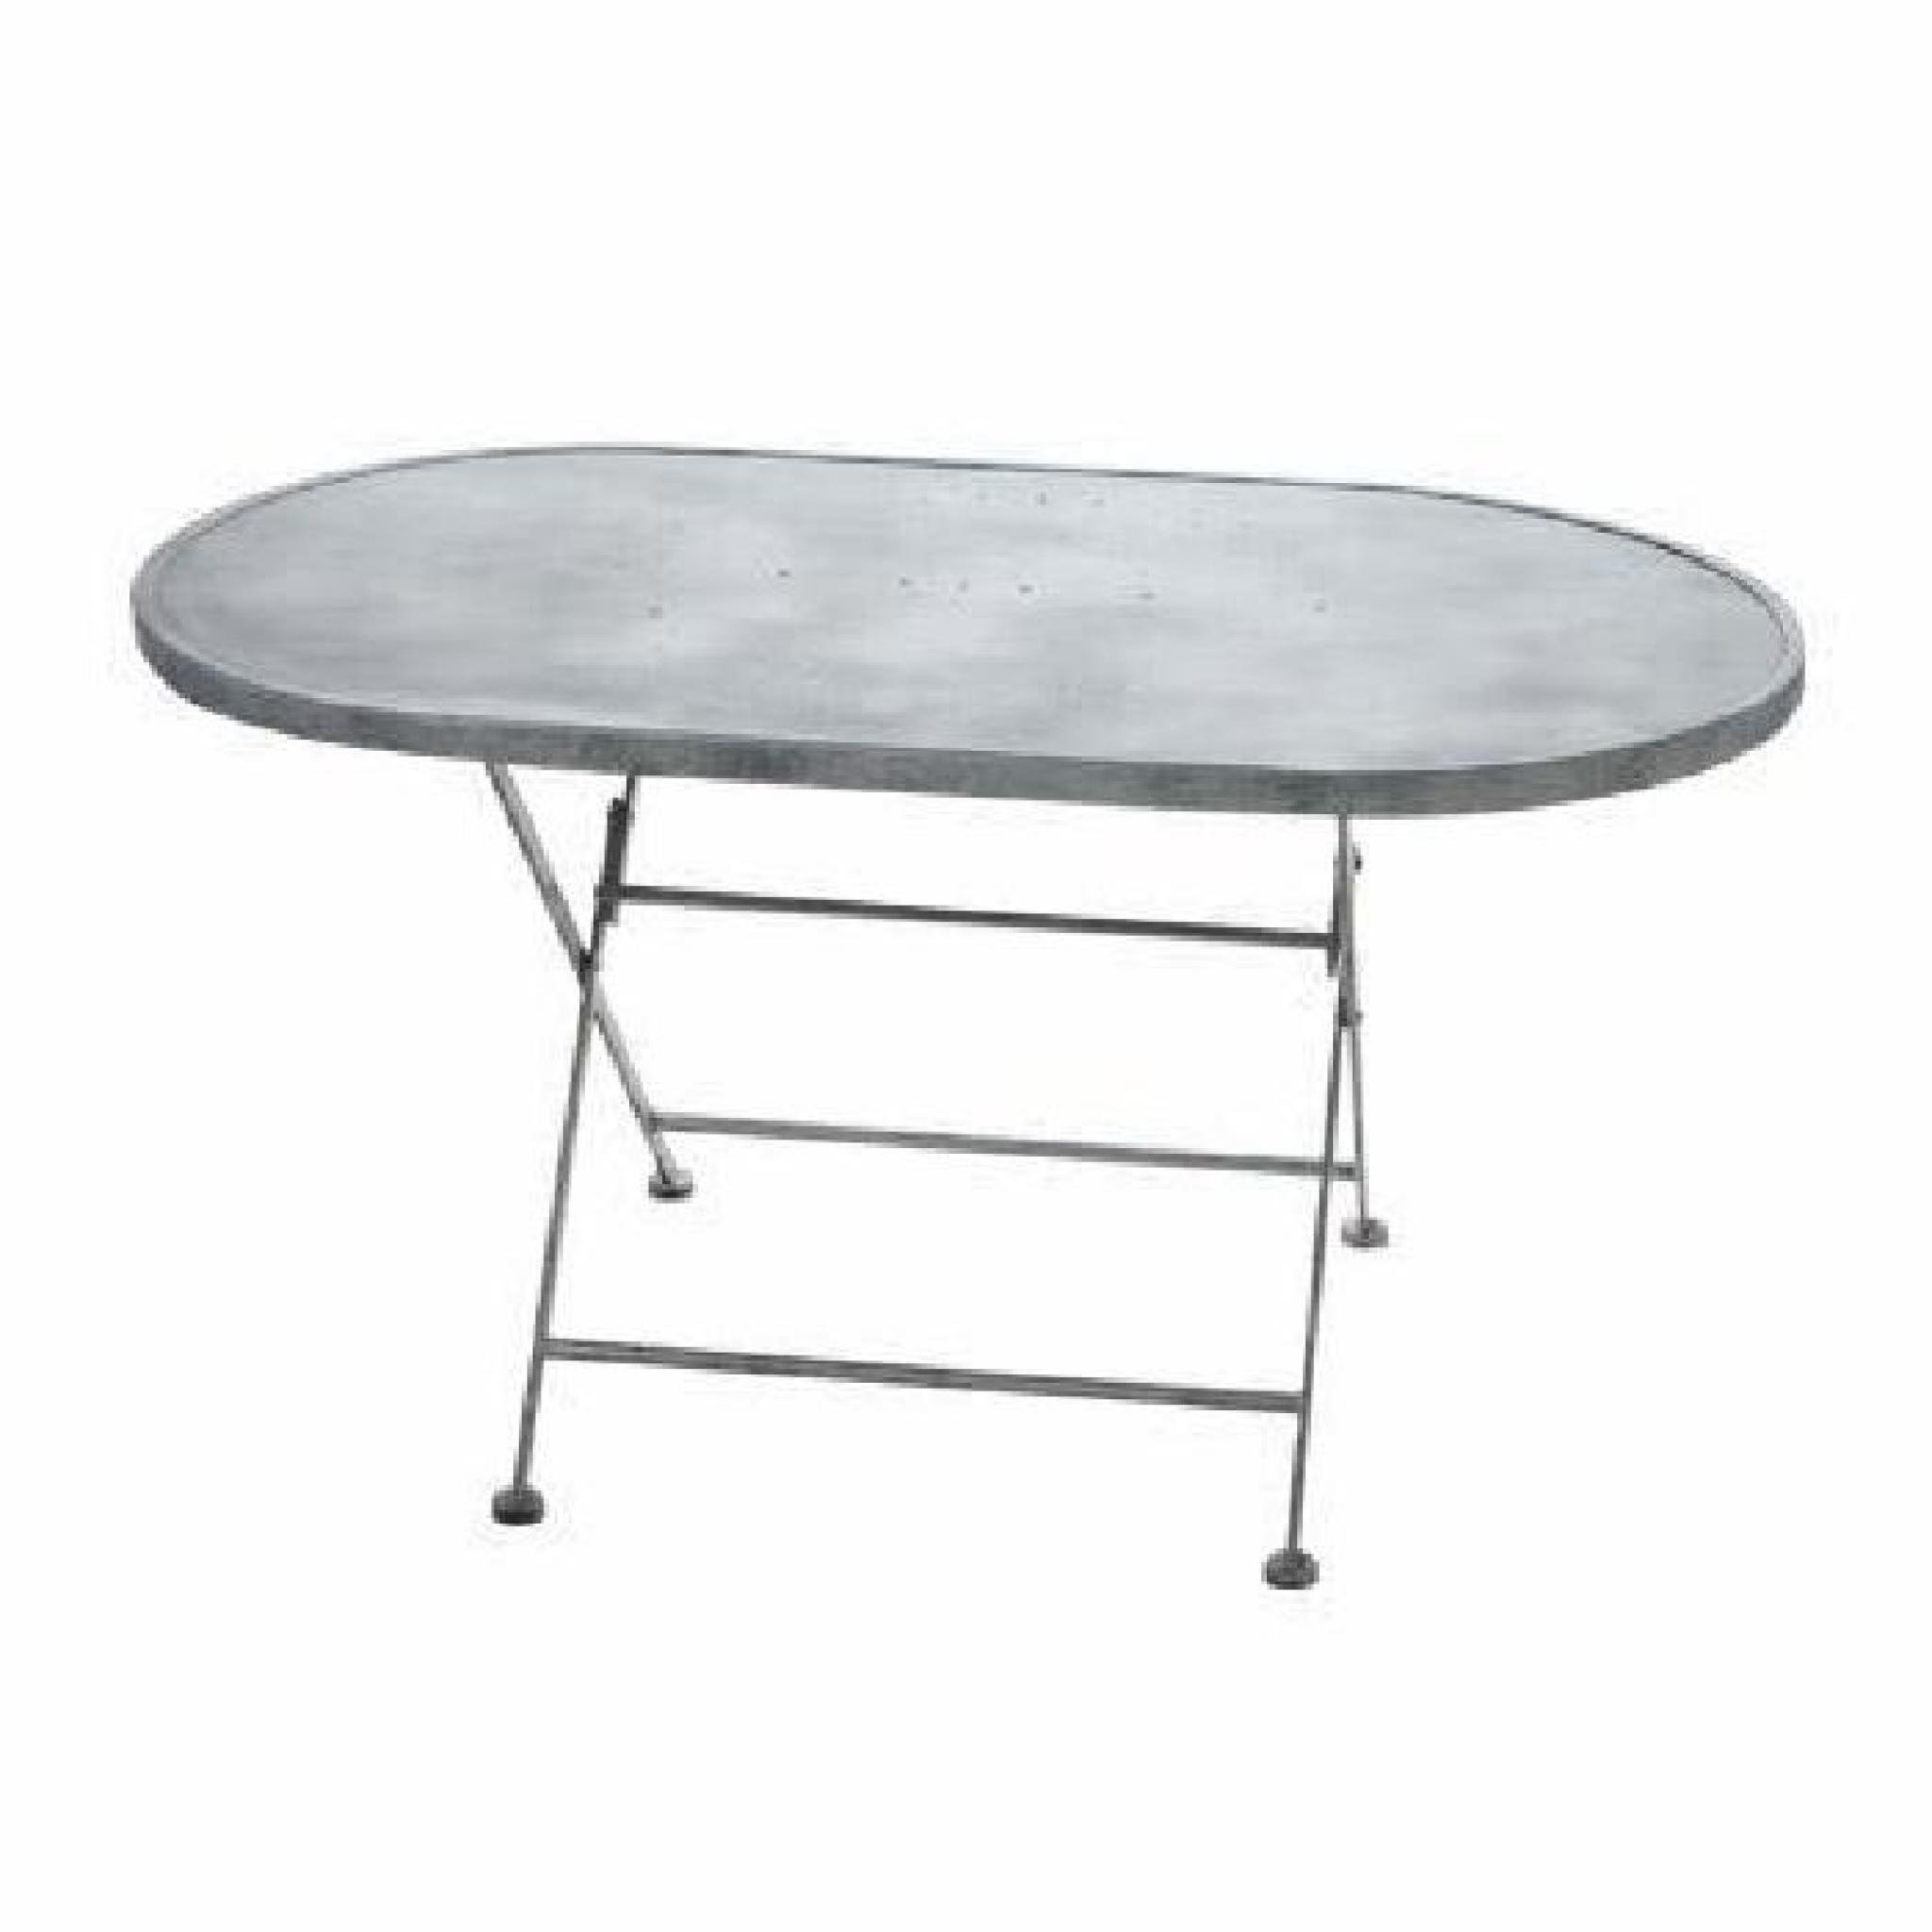 table de jardin ovale metal pliante achat vente table de jardin pliante pas cher. Black Bedroom Furniture Sets. Home Design Ideas